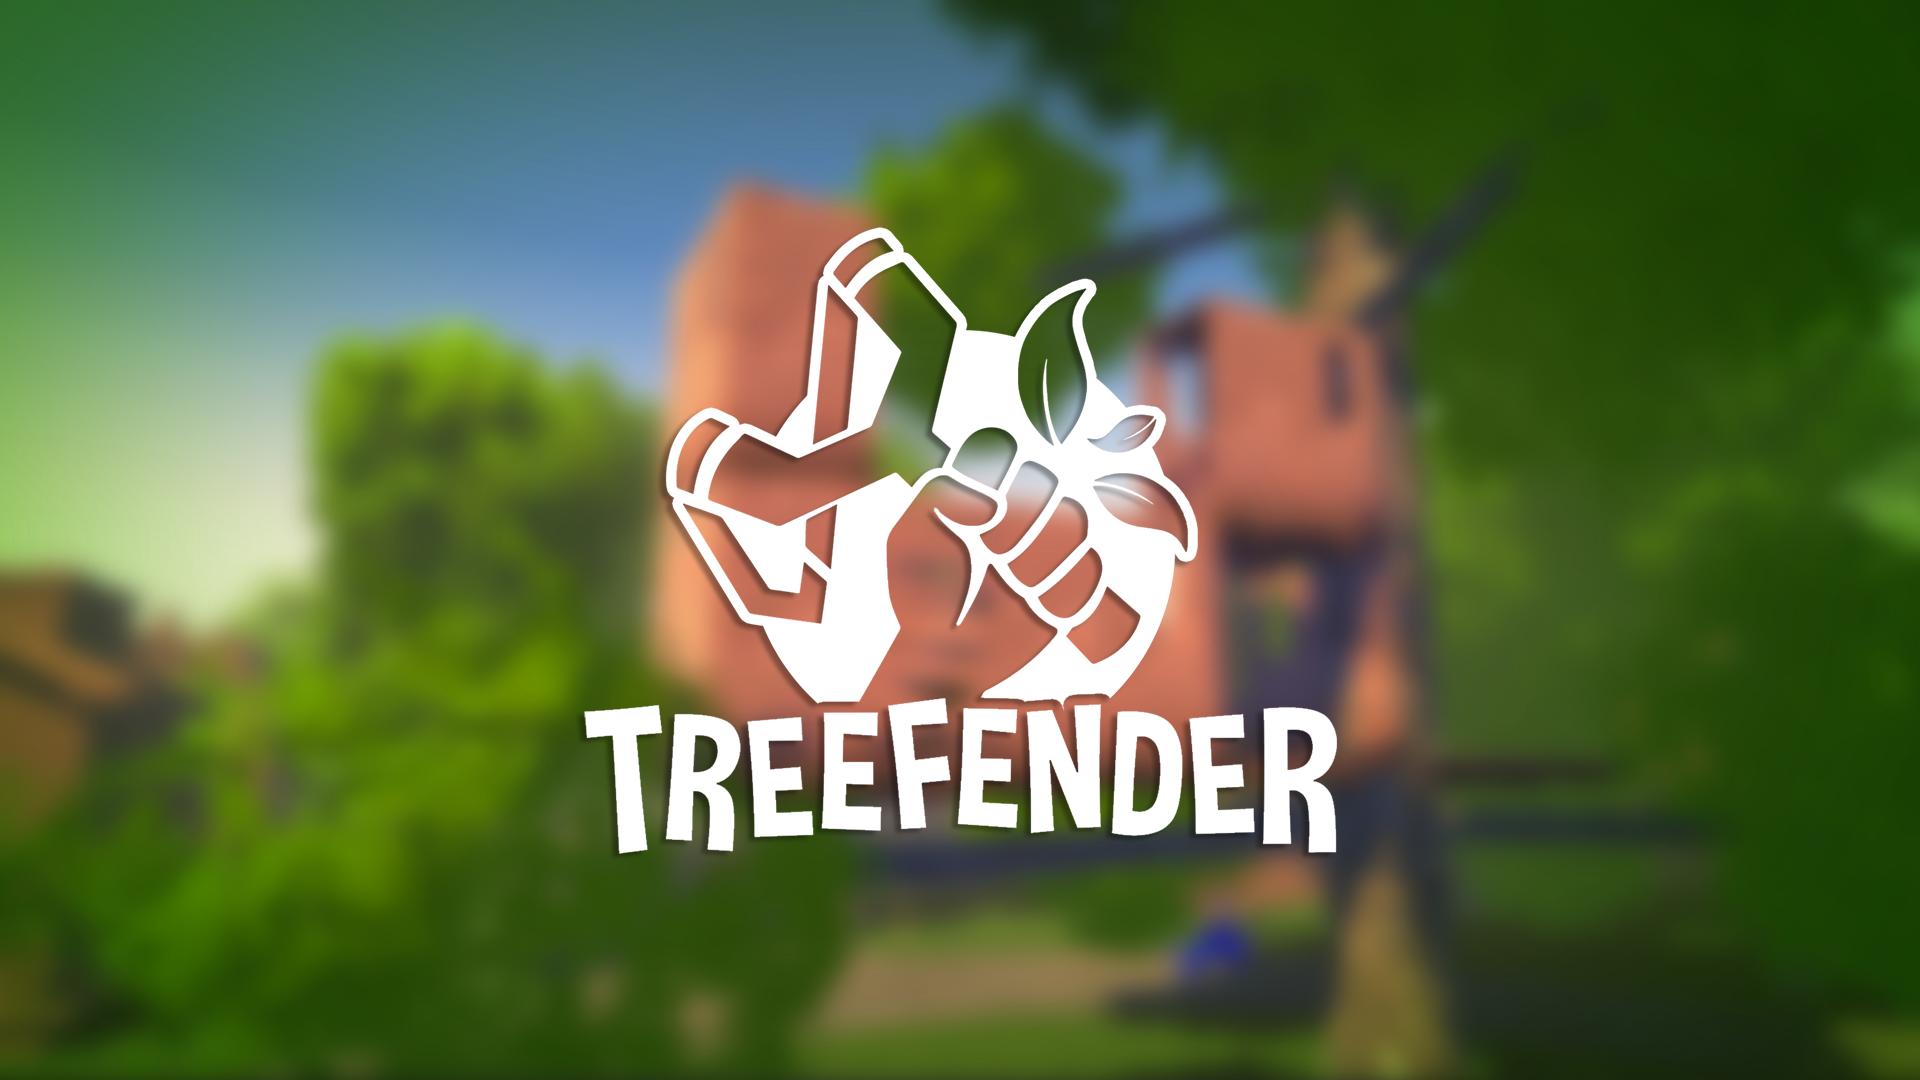 Treefender